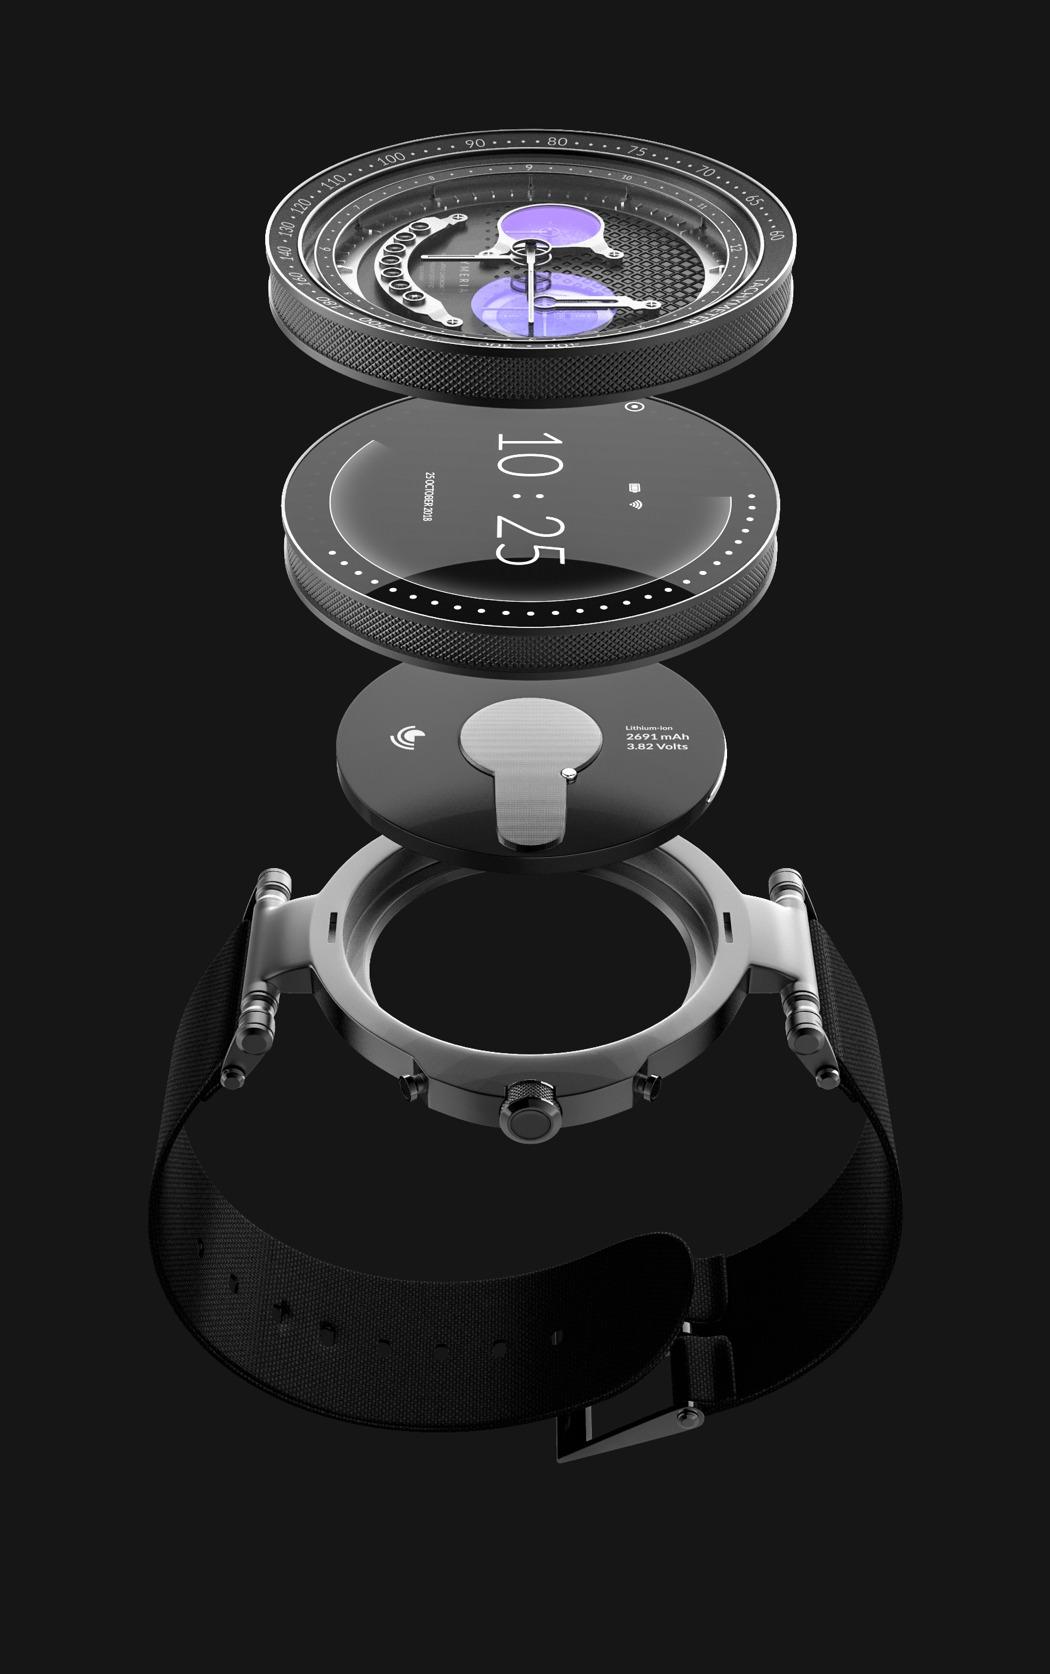 nymeria_customizable_watch_06